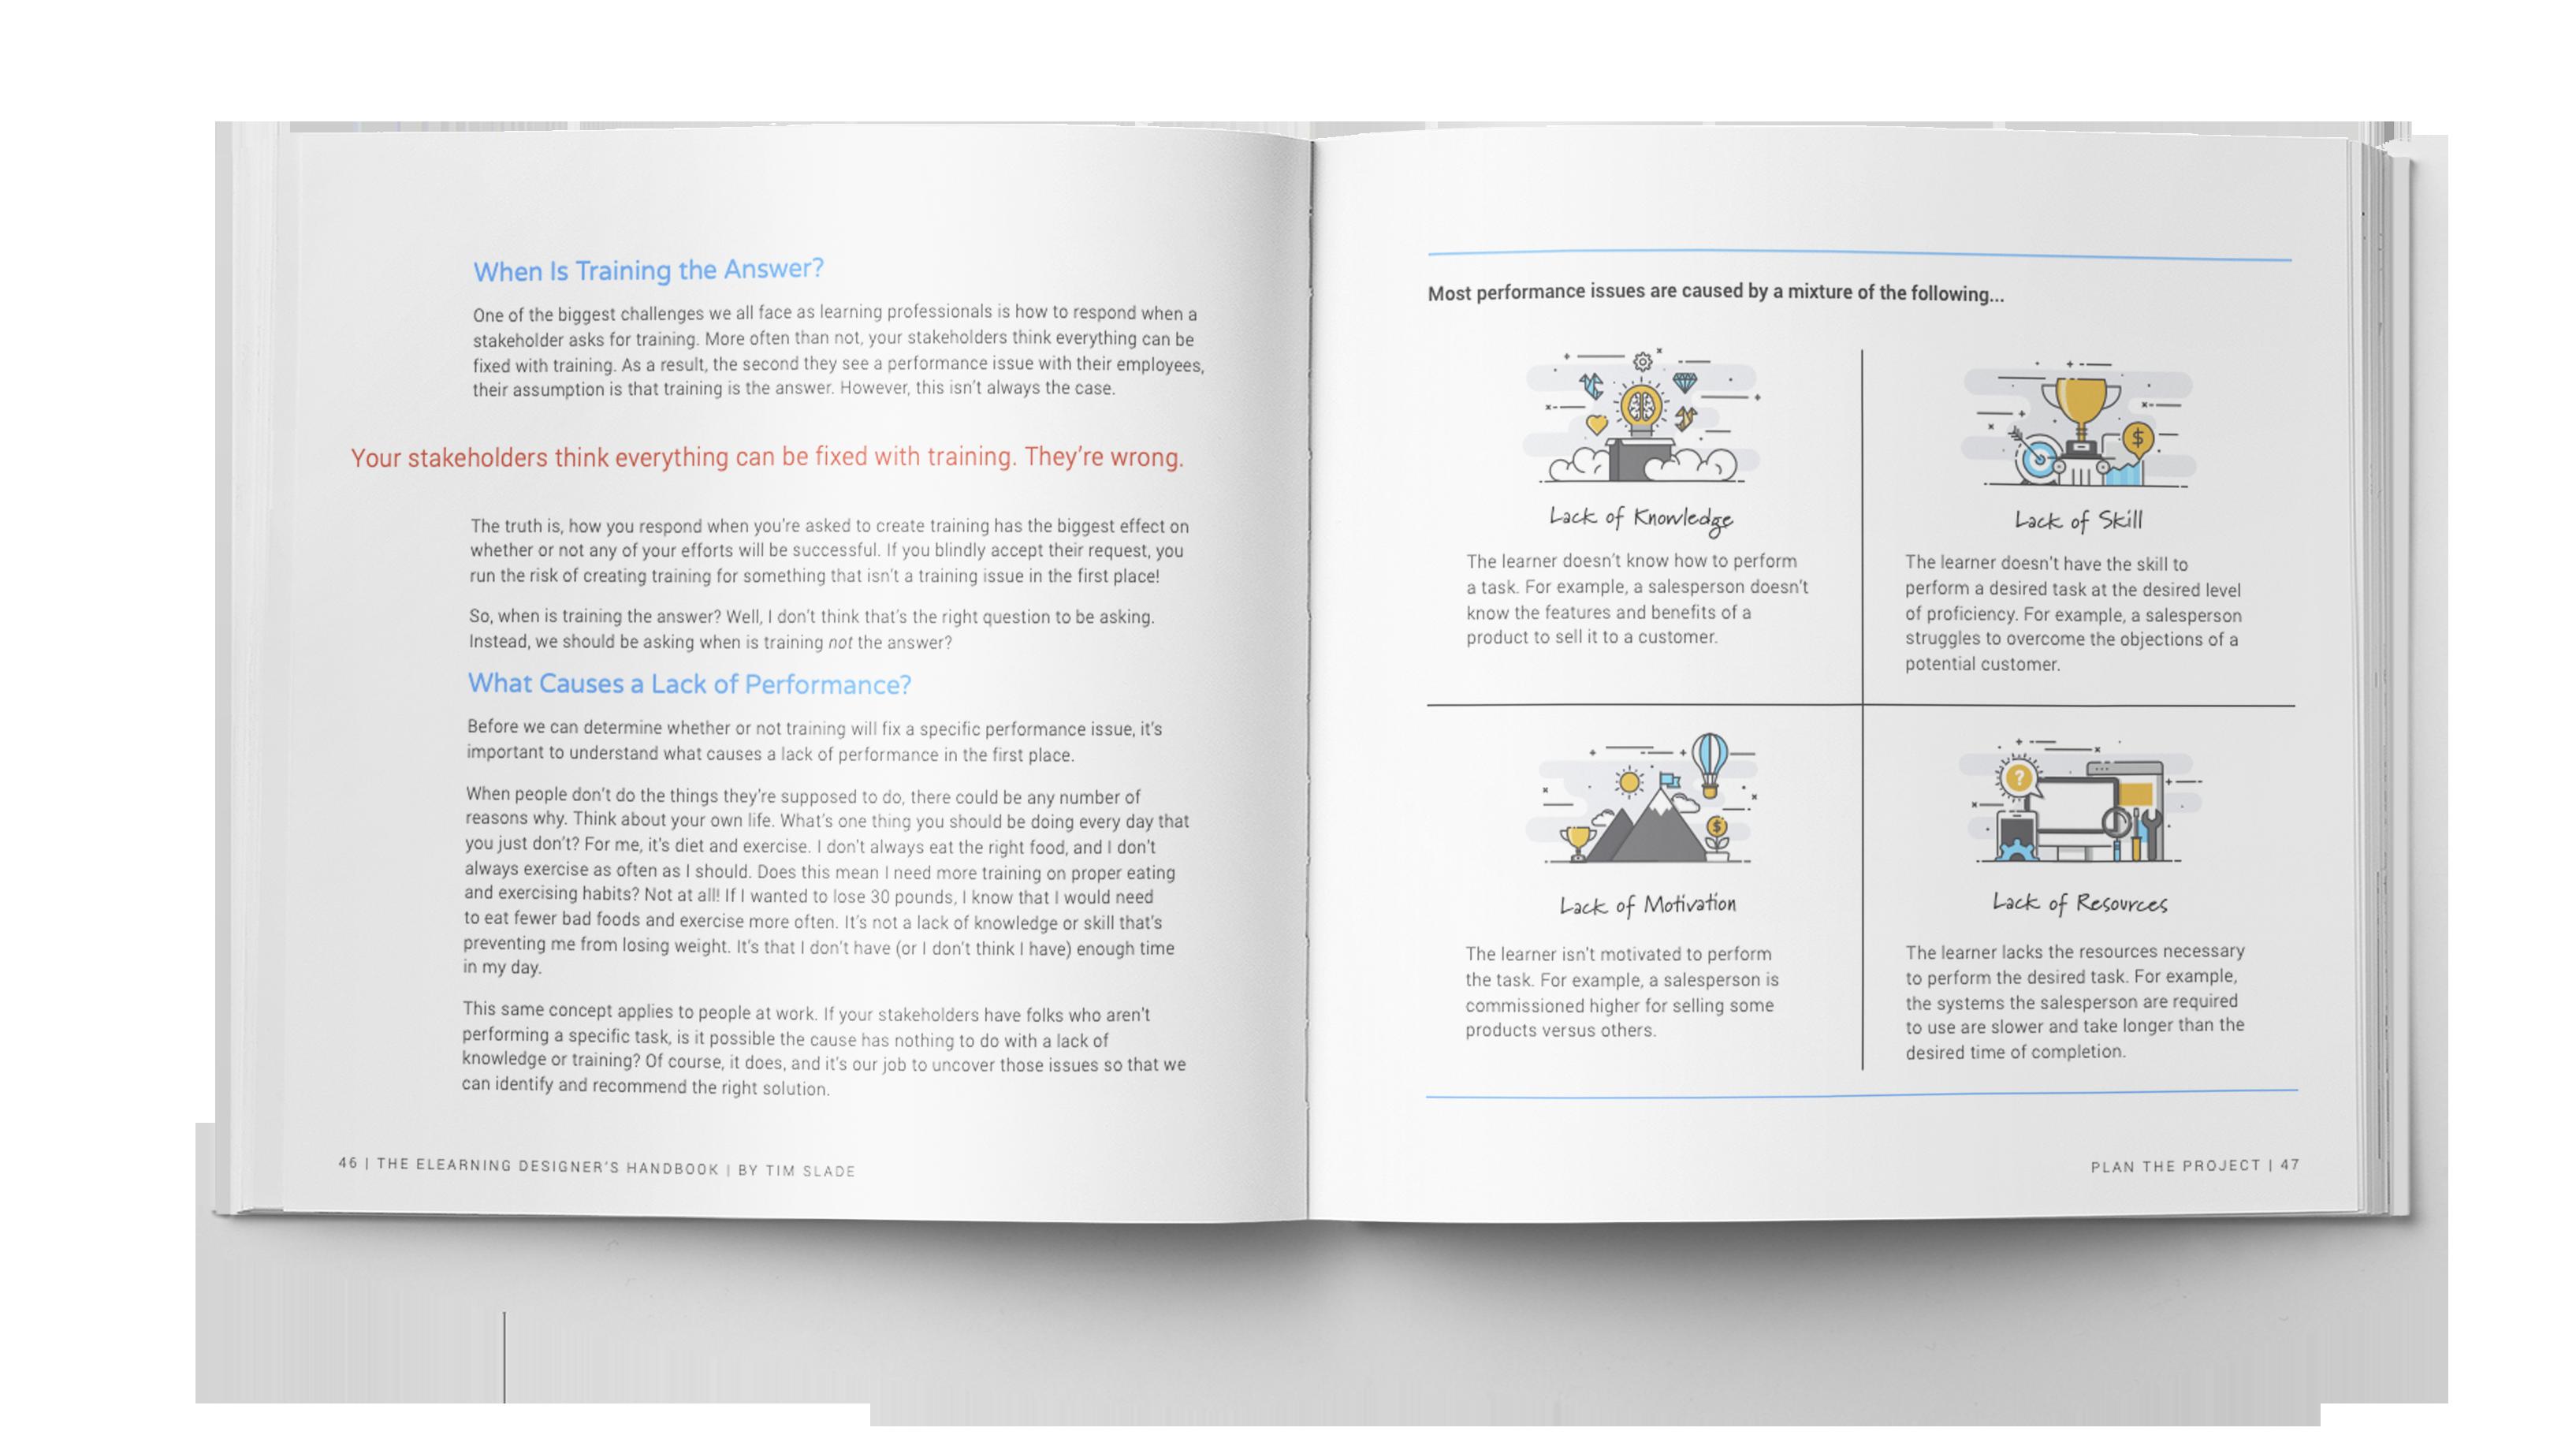 The eLearning Designer's Handbook by Tim Slade   Plan the Project   Freelance eLearning Designer   The eLearning Designer's Academy